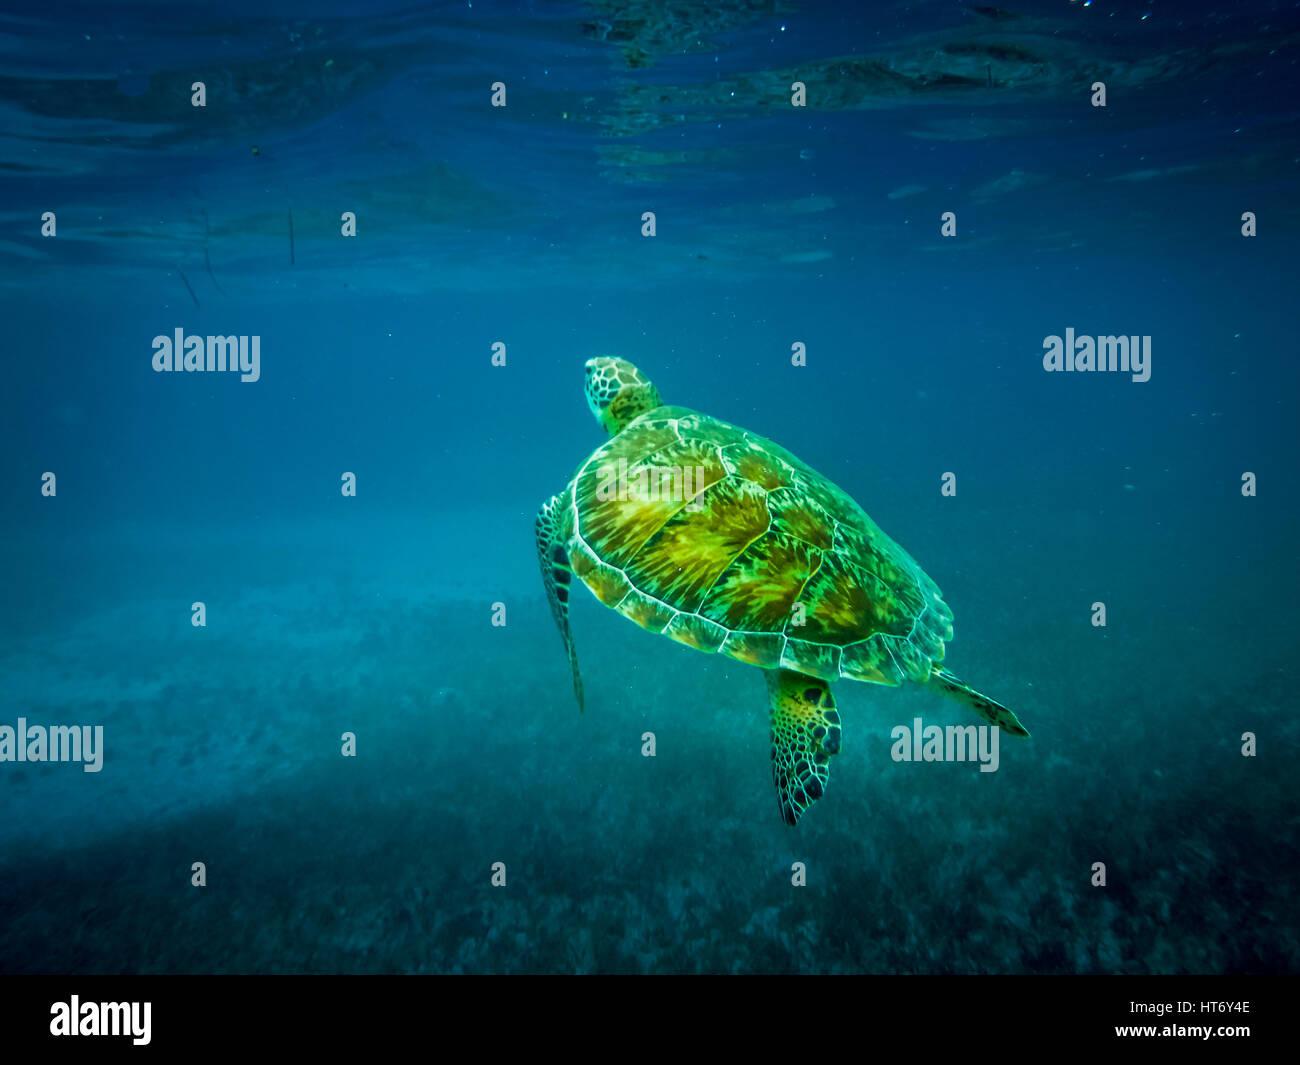 Sea turtle in caribbean sea - Caye Caulker, Belize Stock Photo